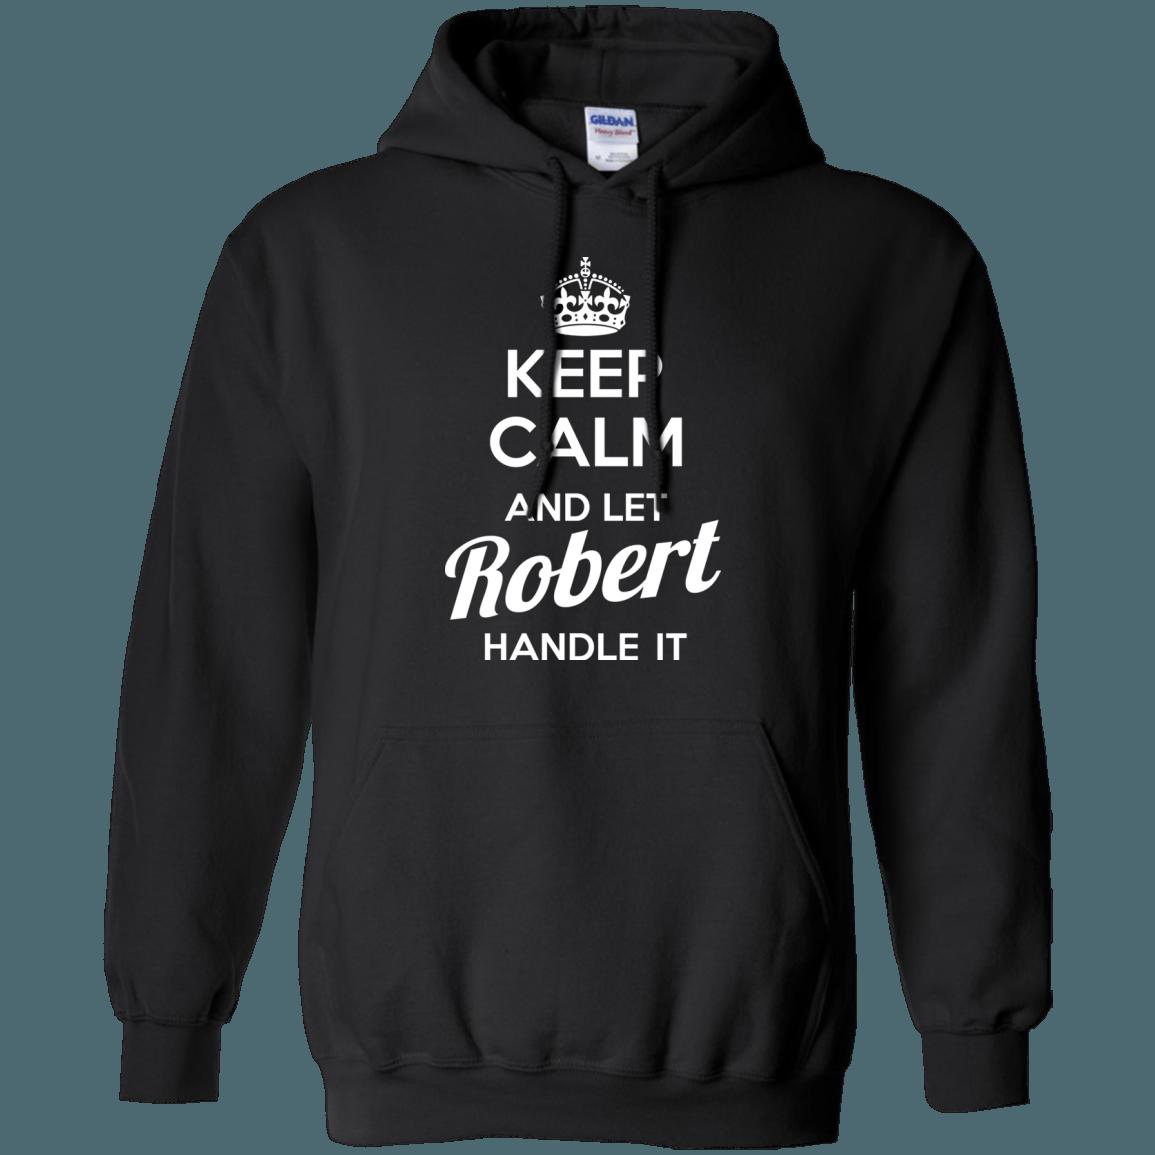 Keep calm and let Robert handle it t shirt & hoodies